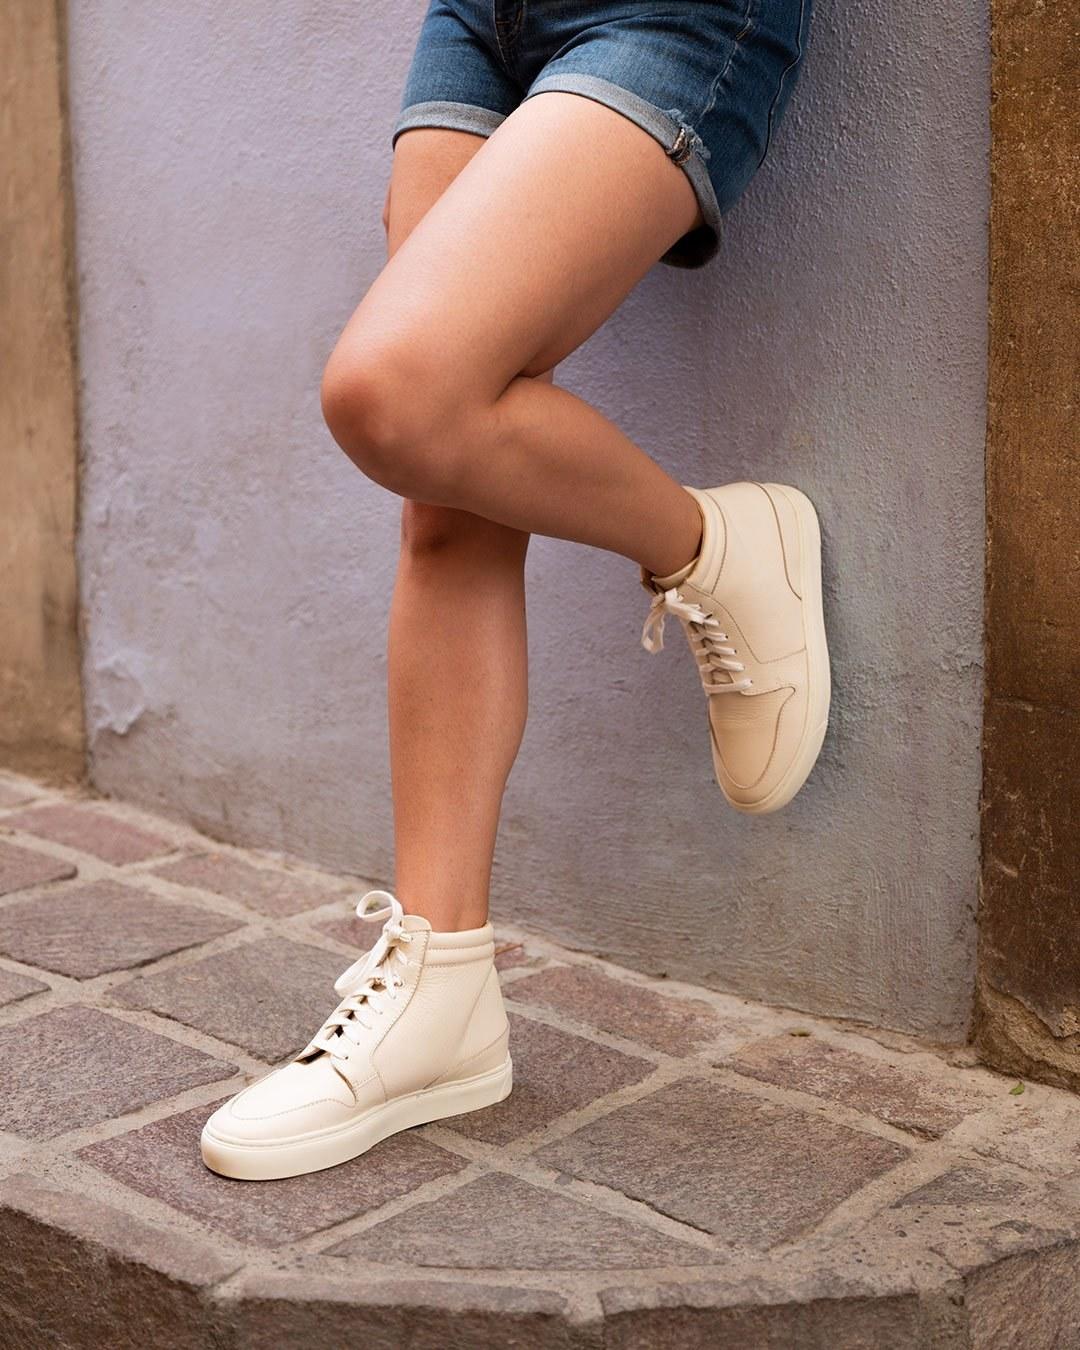 model wearing bone-colored high top sneakers